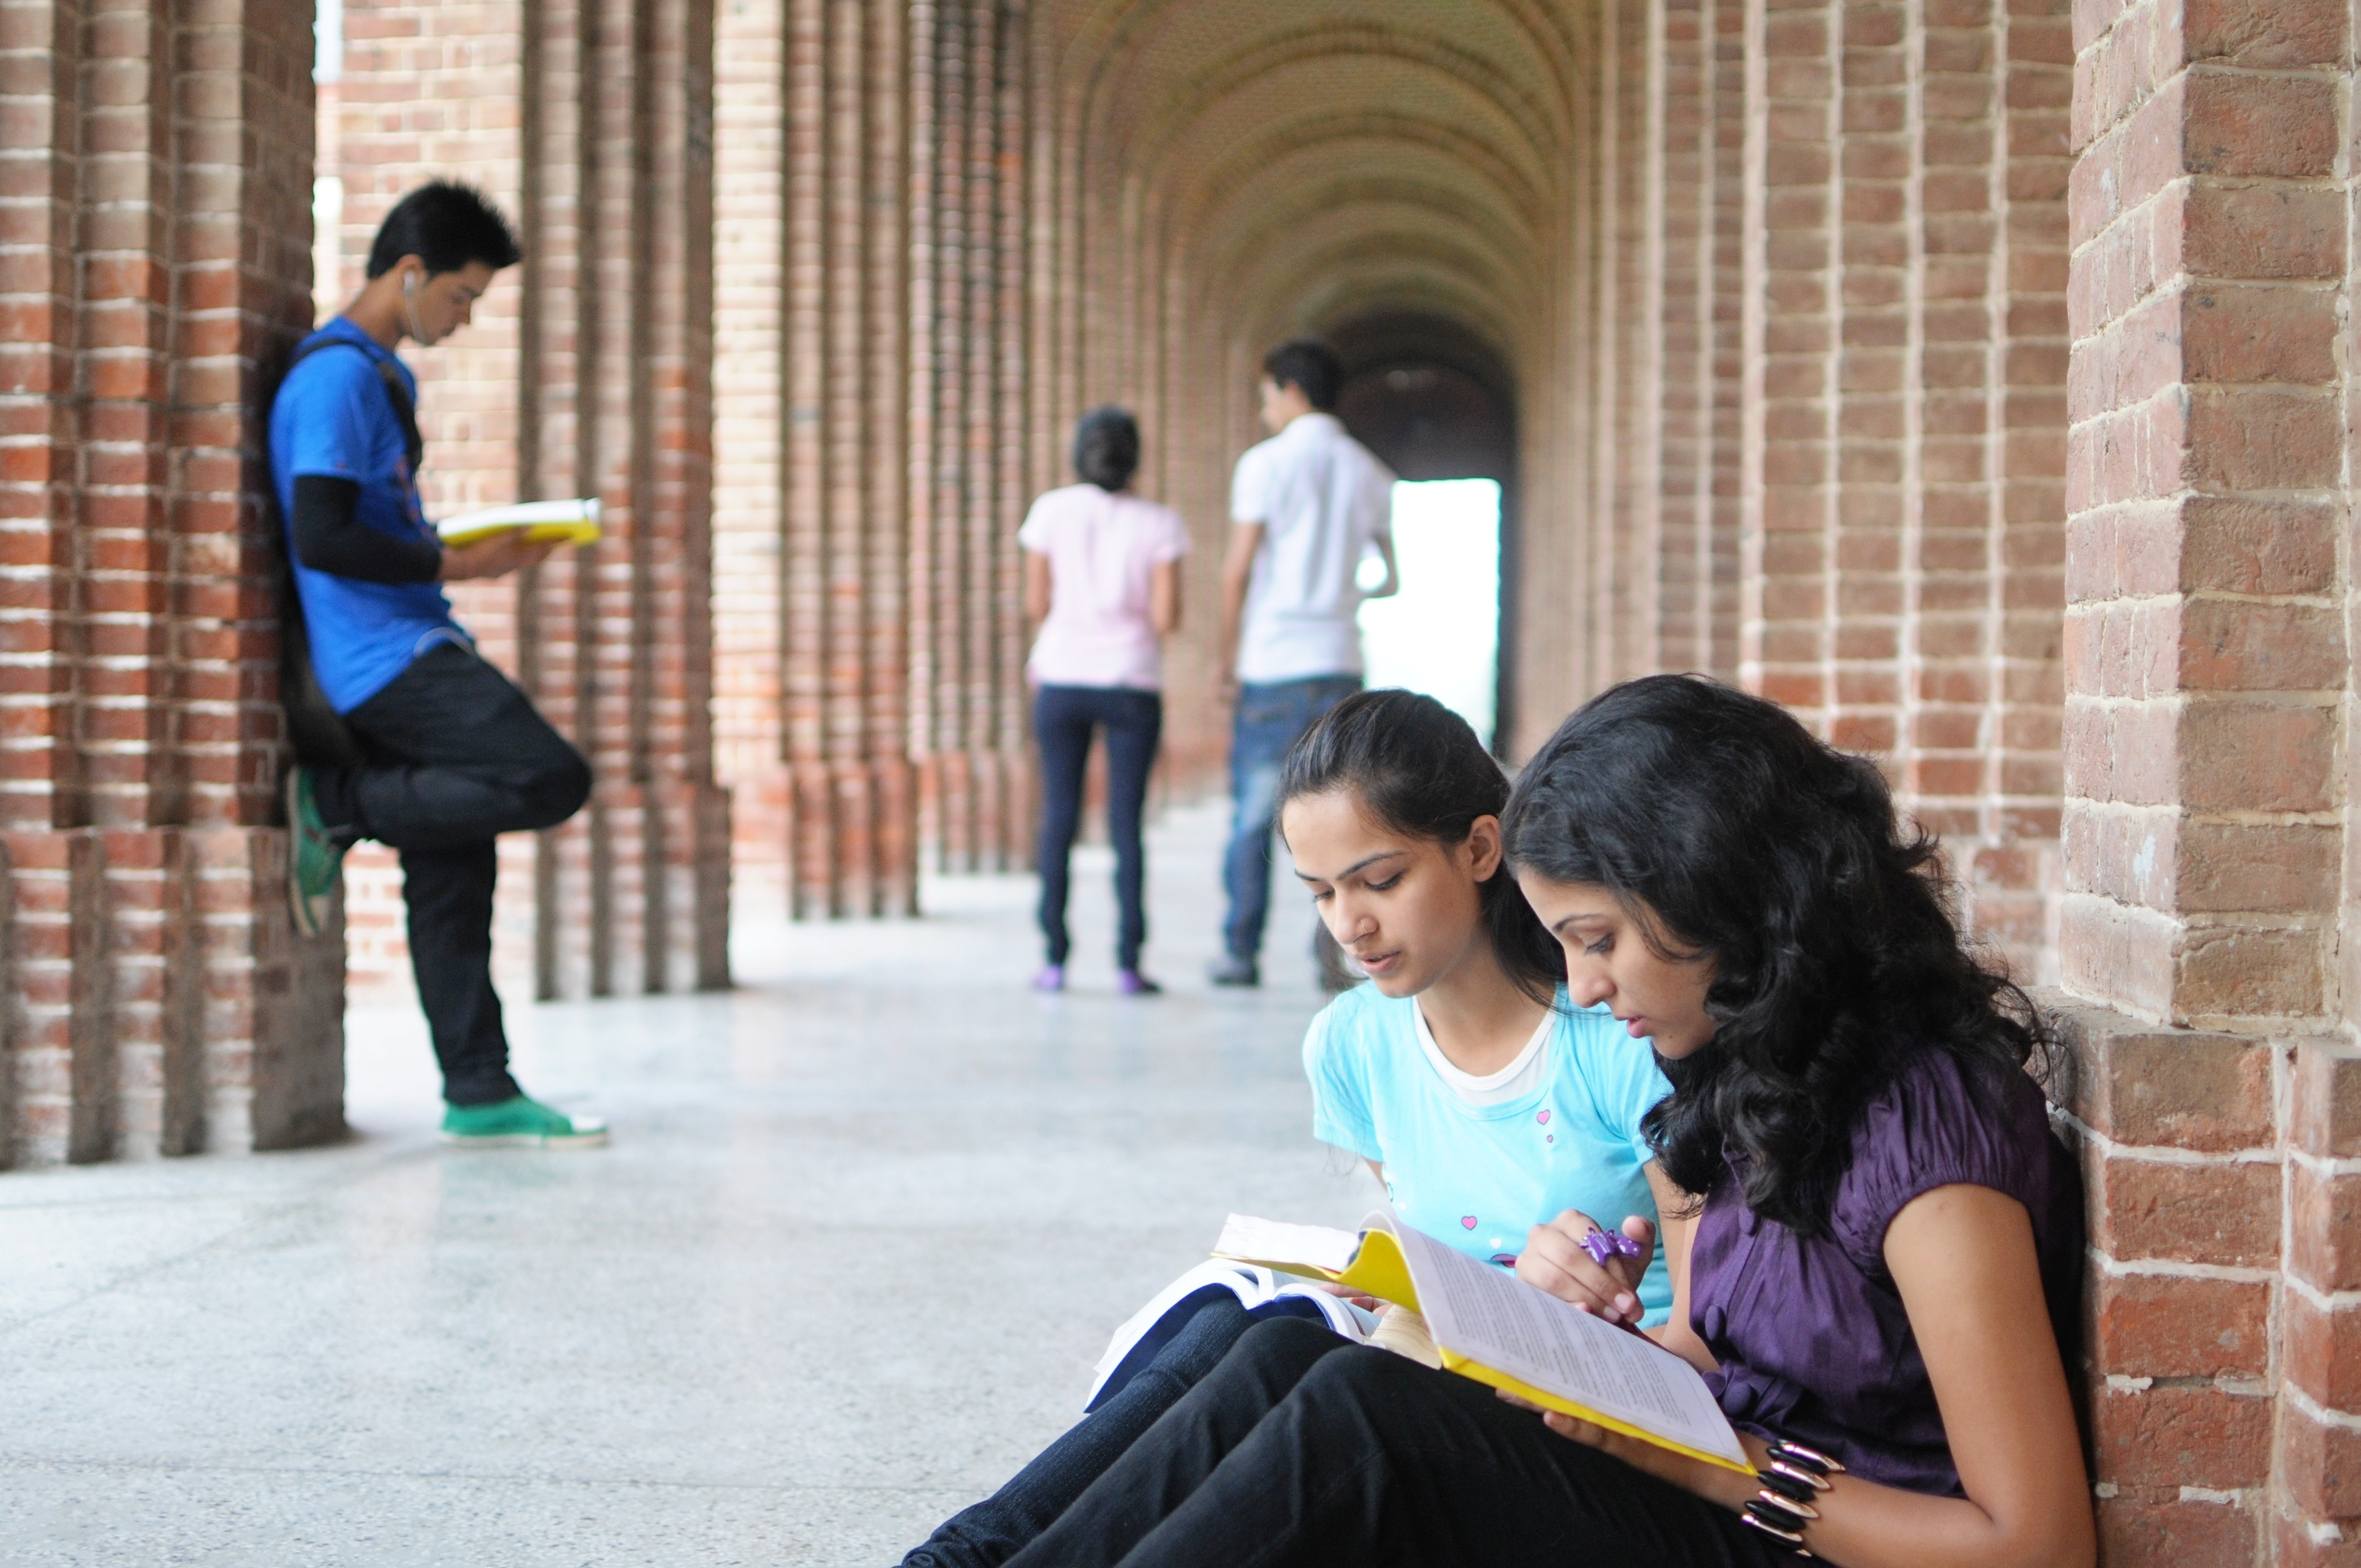 Tech courses take a hit as jobs shrink